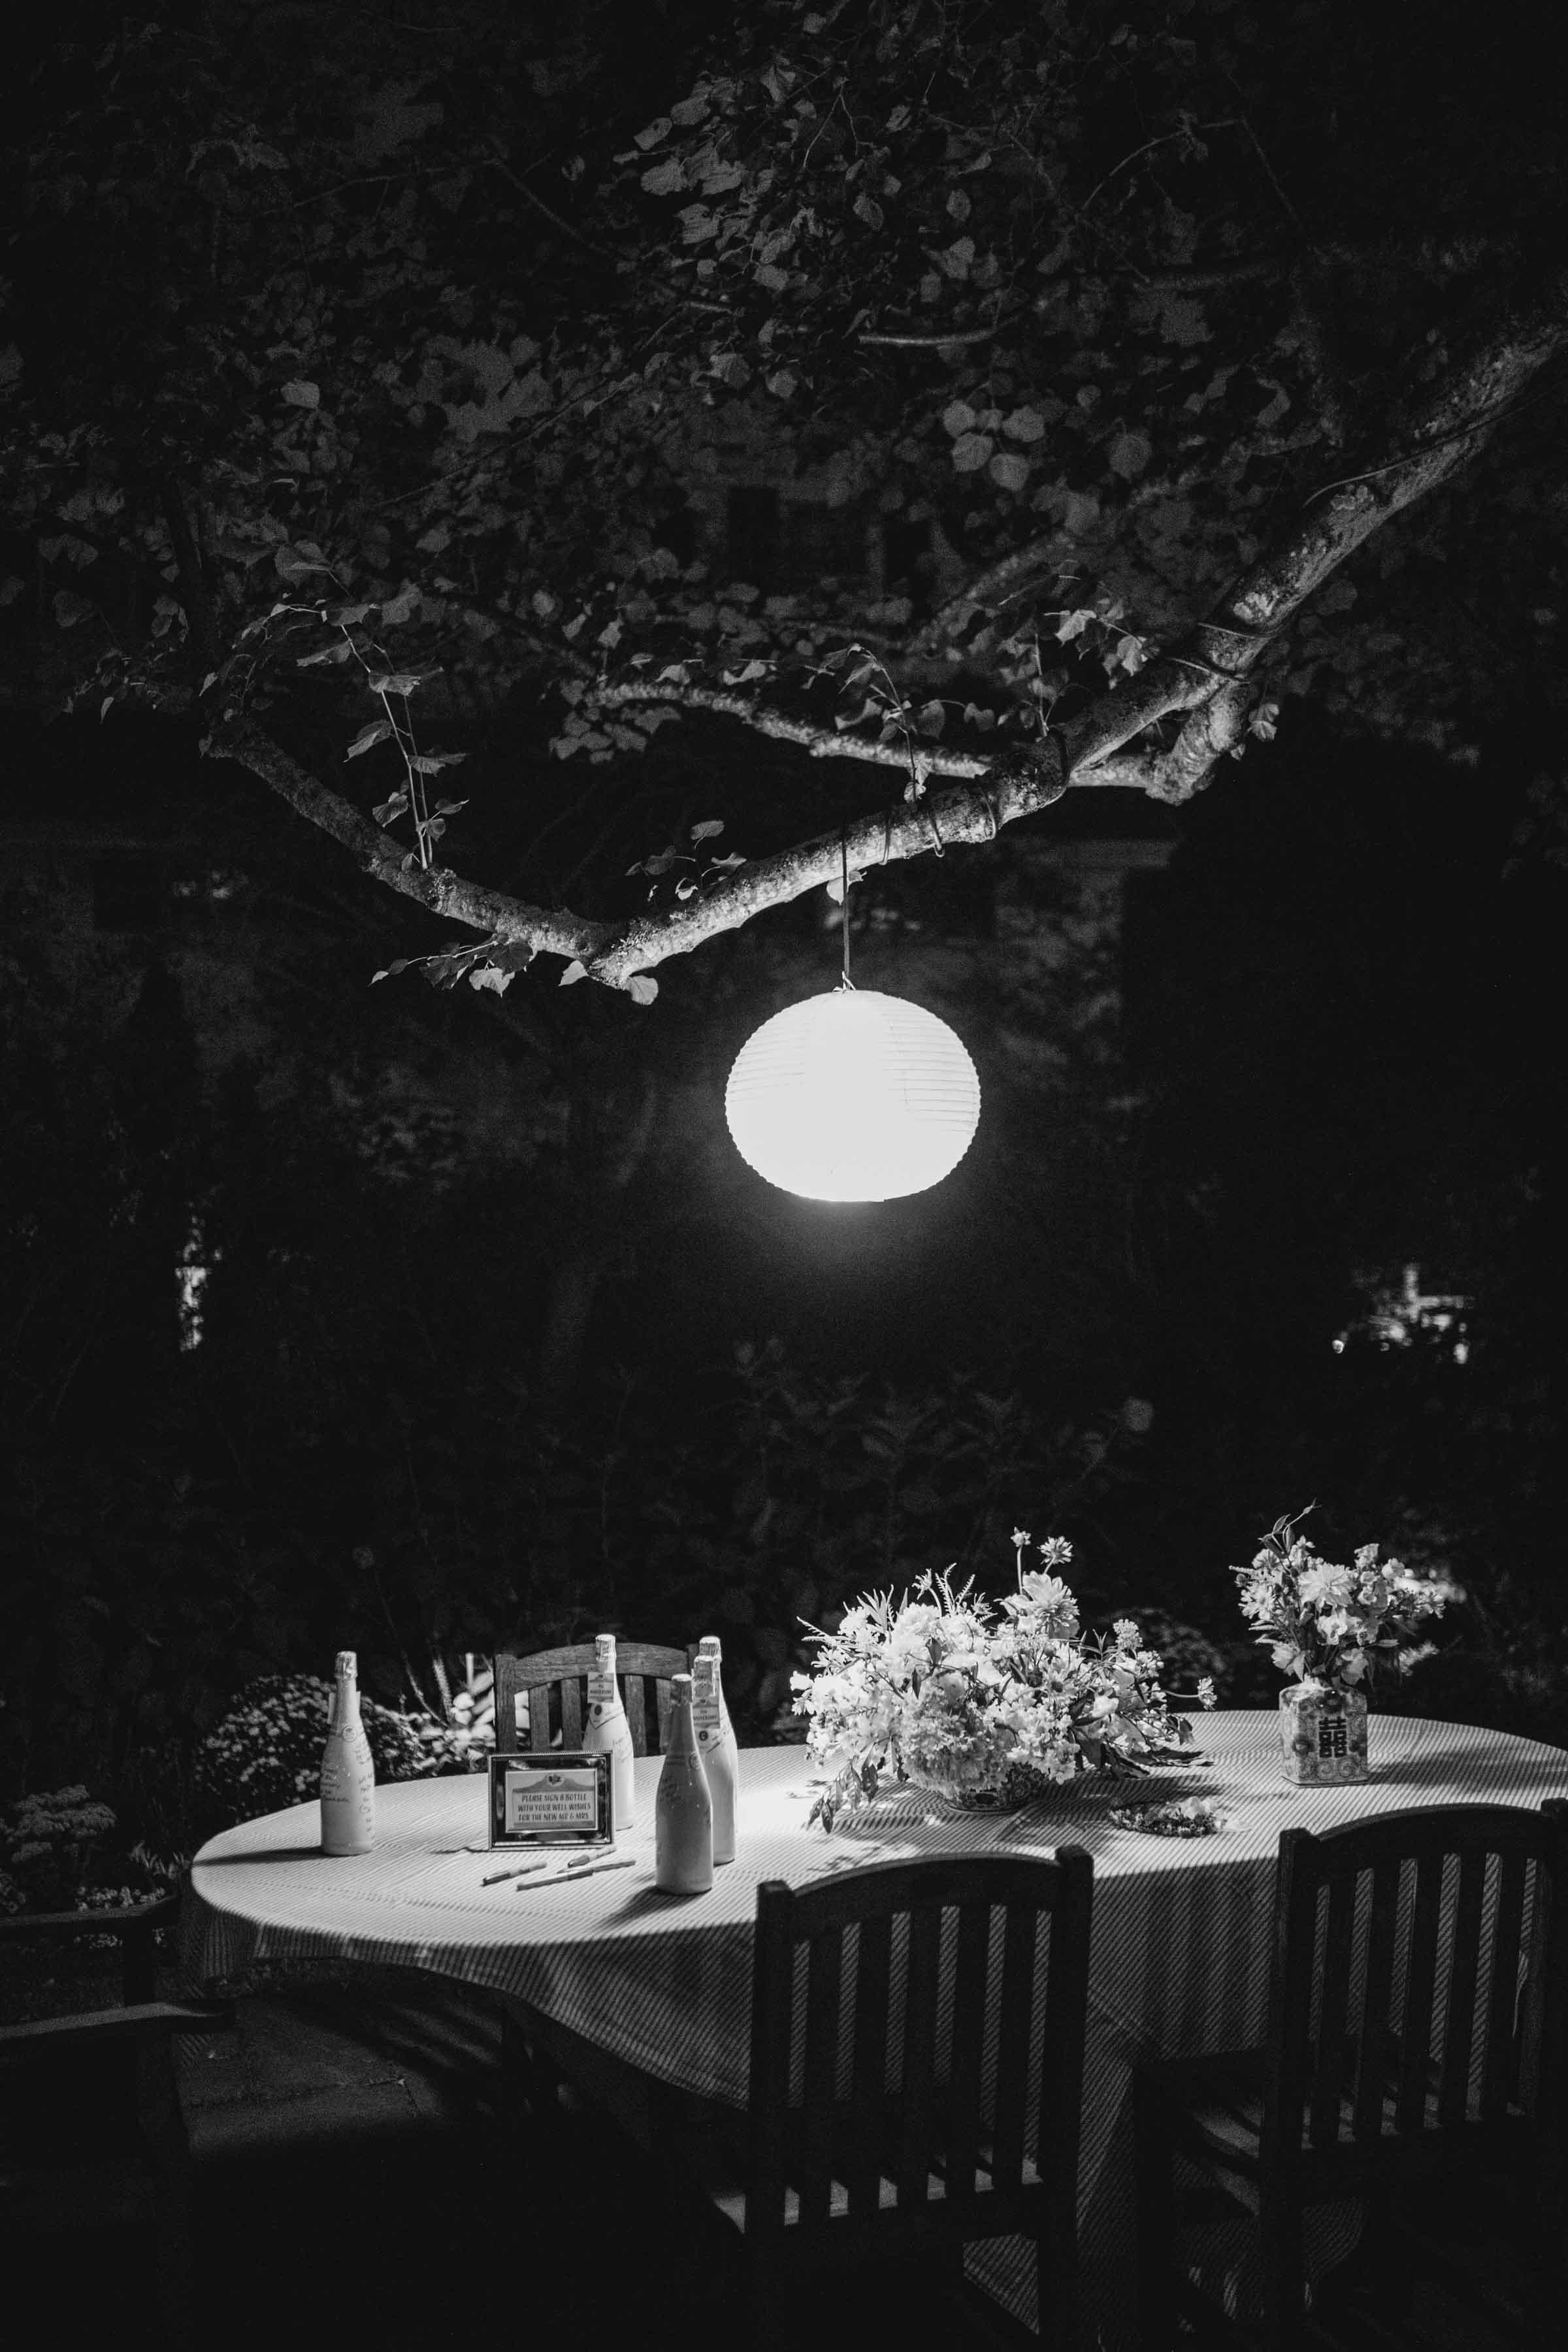 Marthas-vineyard-wedding-56.jpg